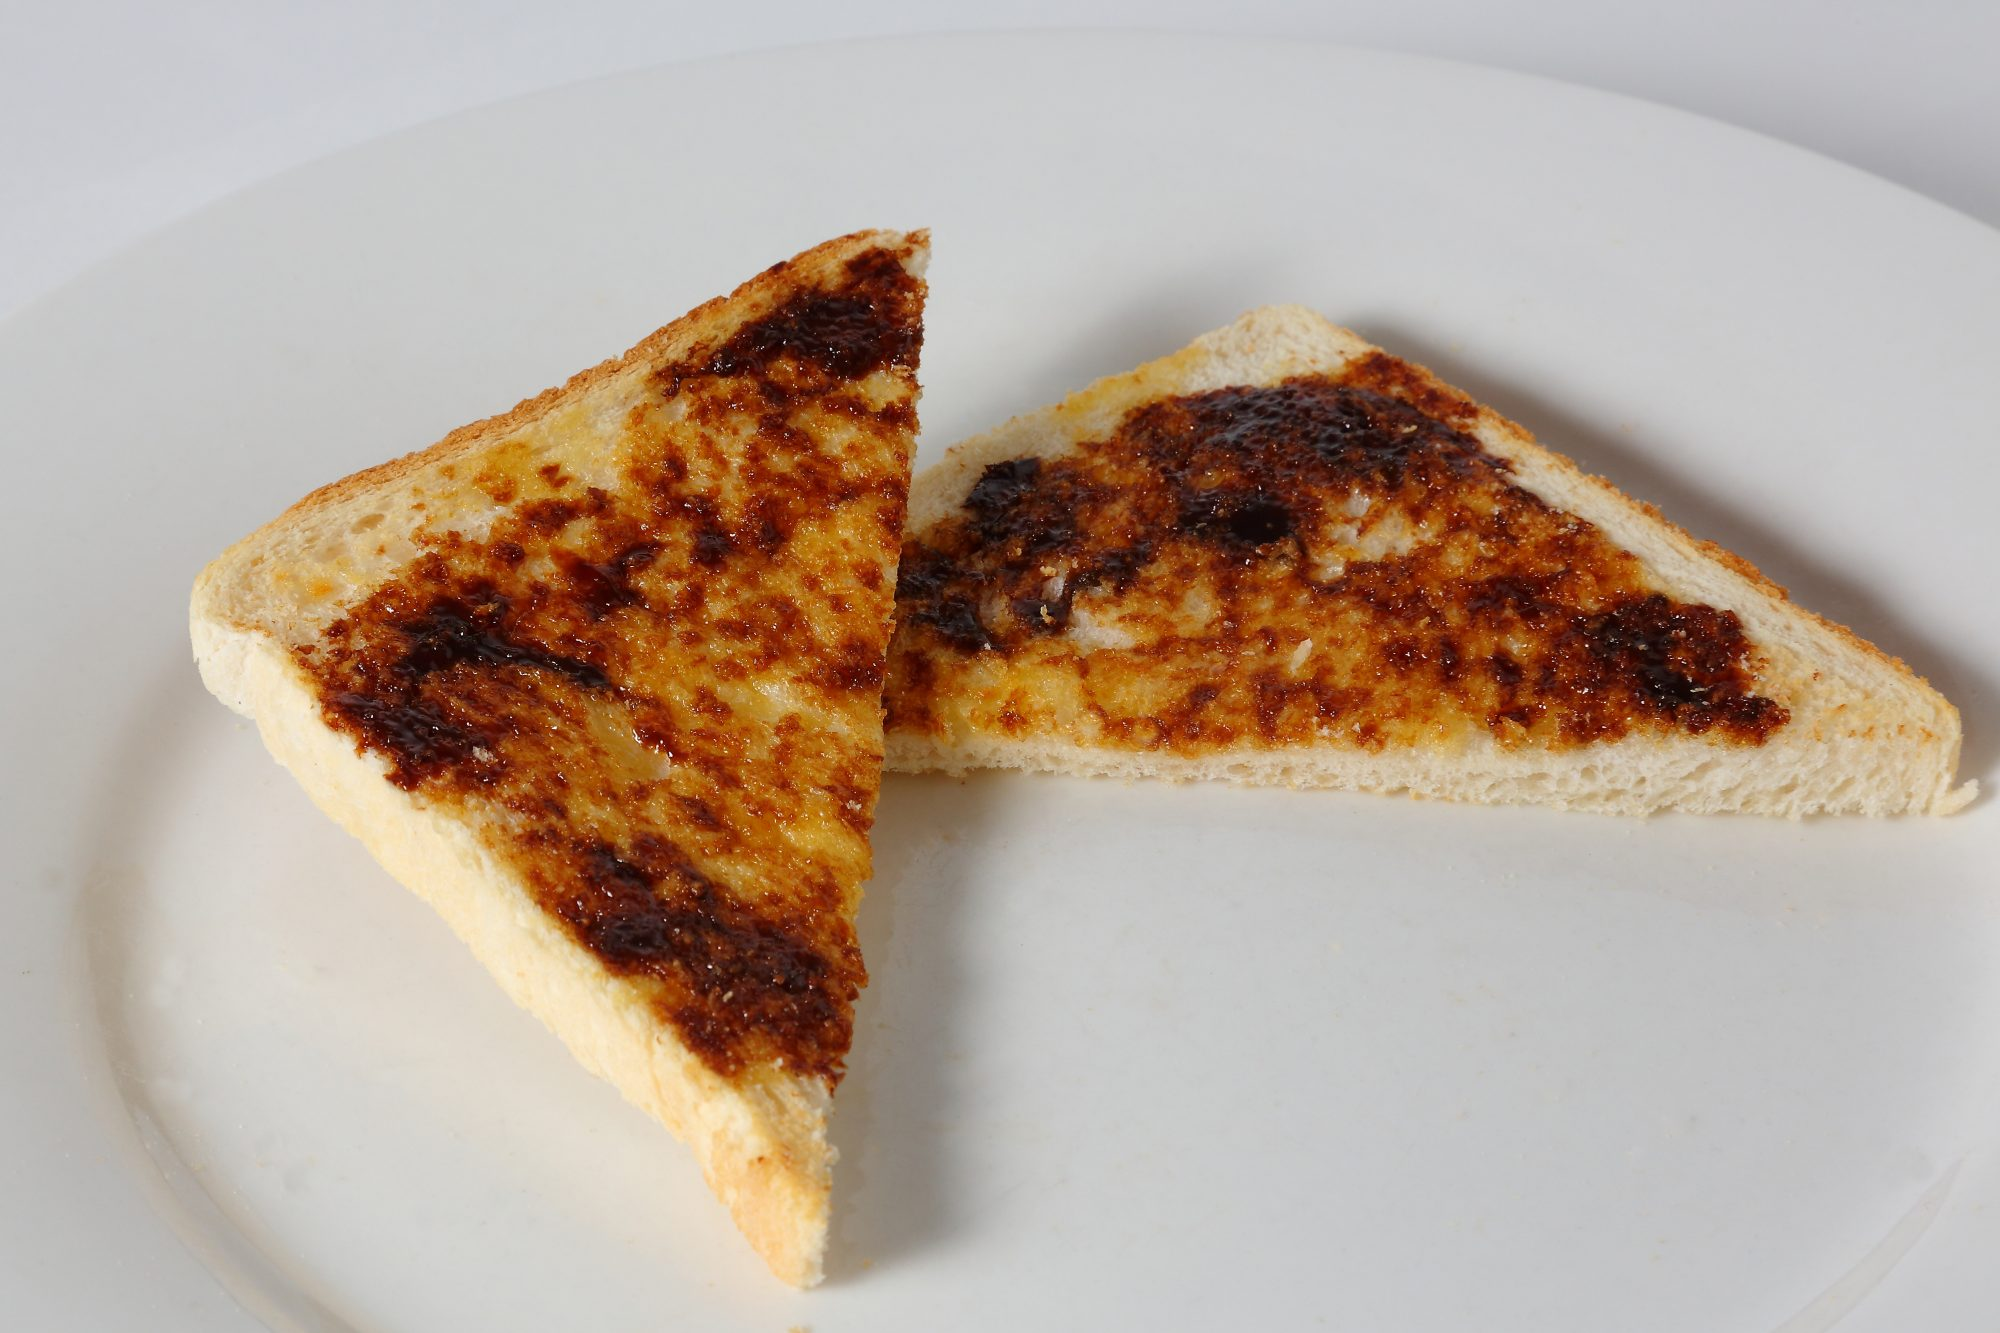 Vegemite on cut toast Getty 6/8/20